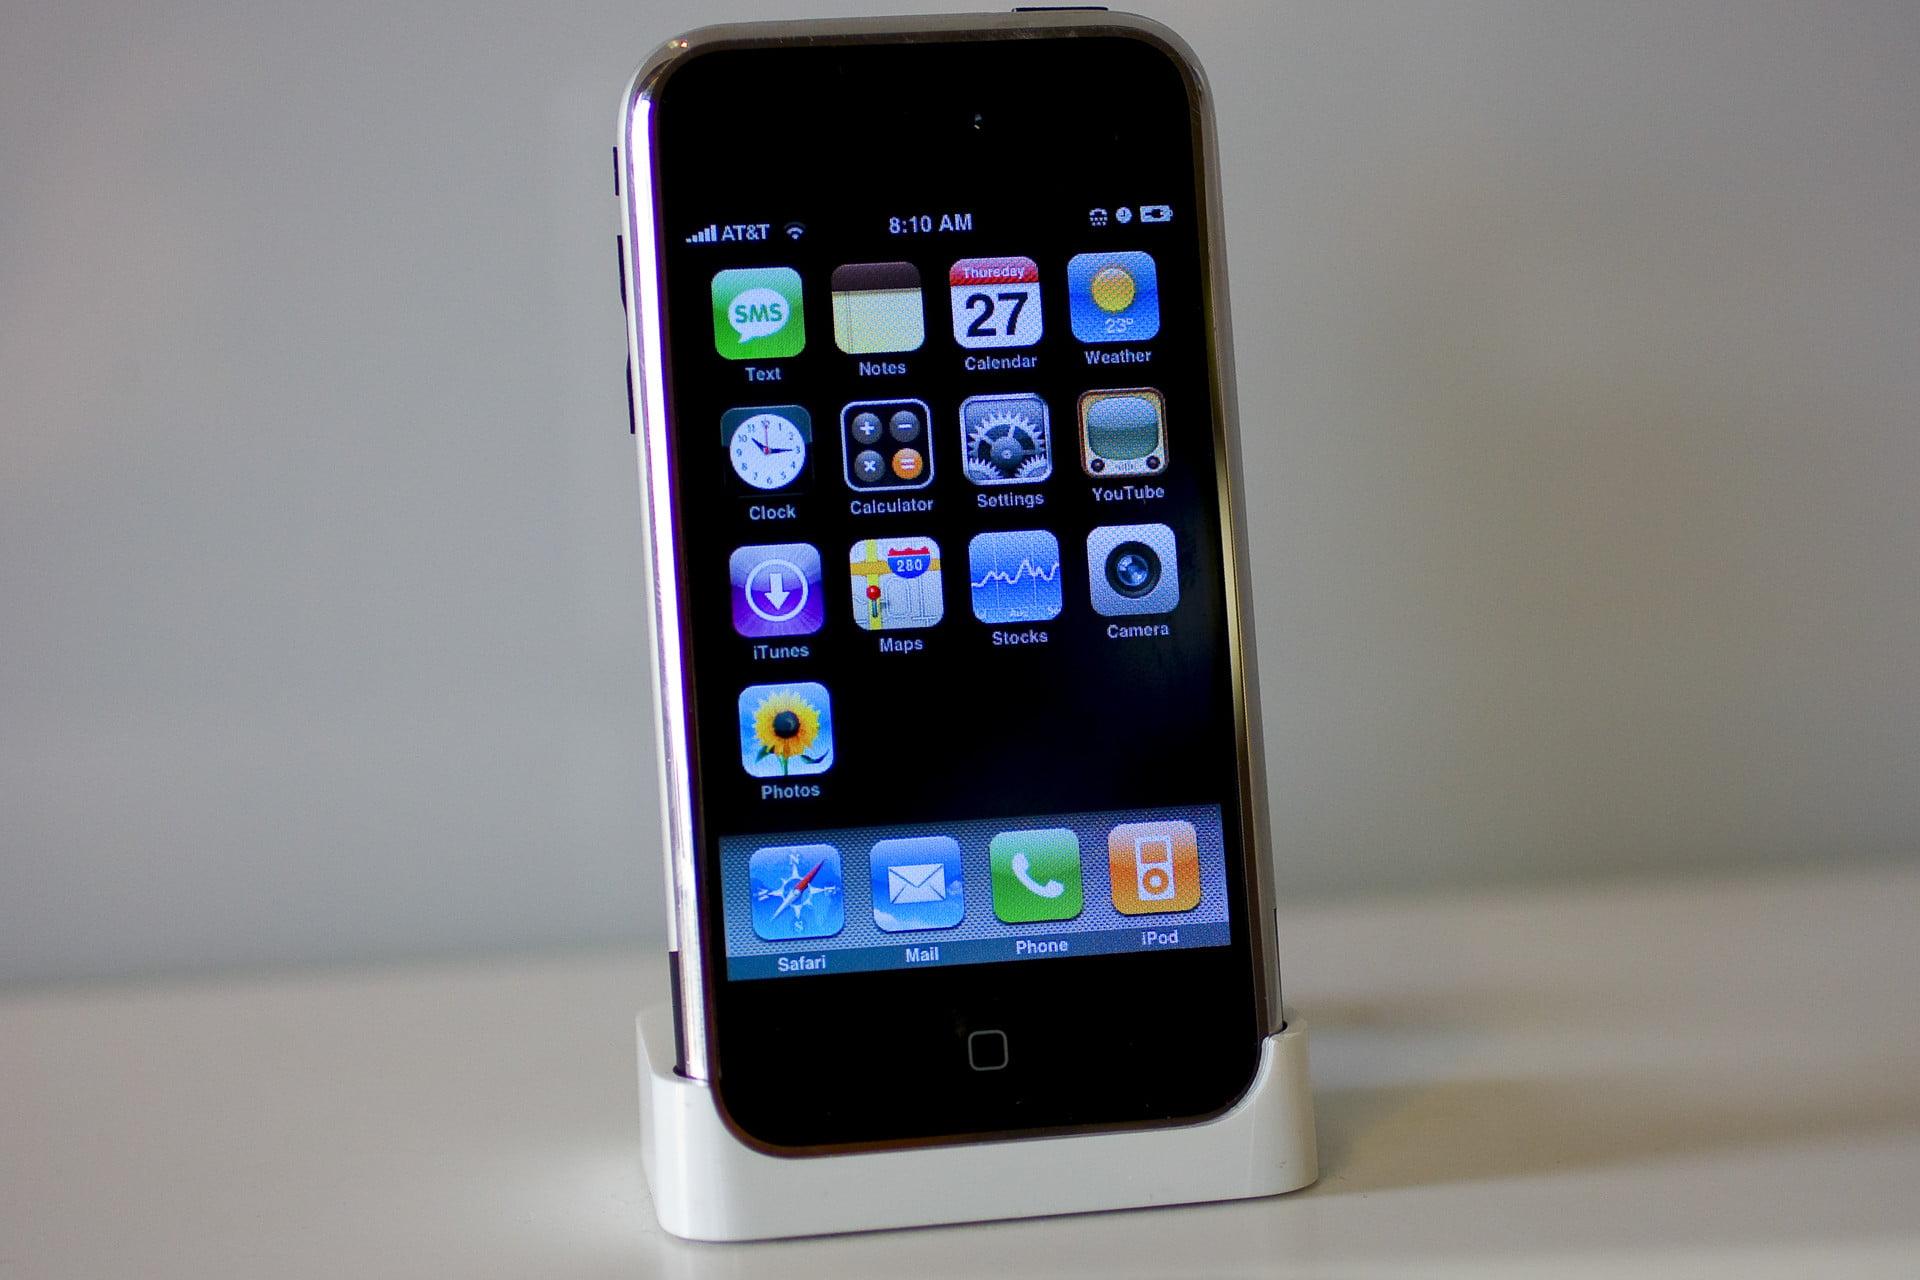 produk terbaik Apple yang didesain oleh Jony Ive